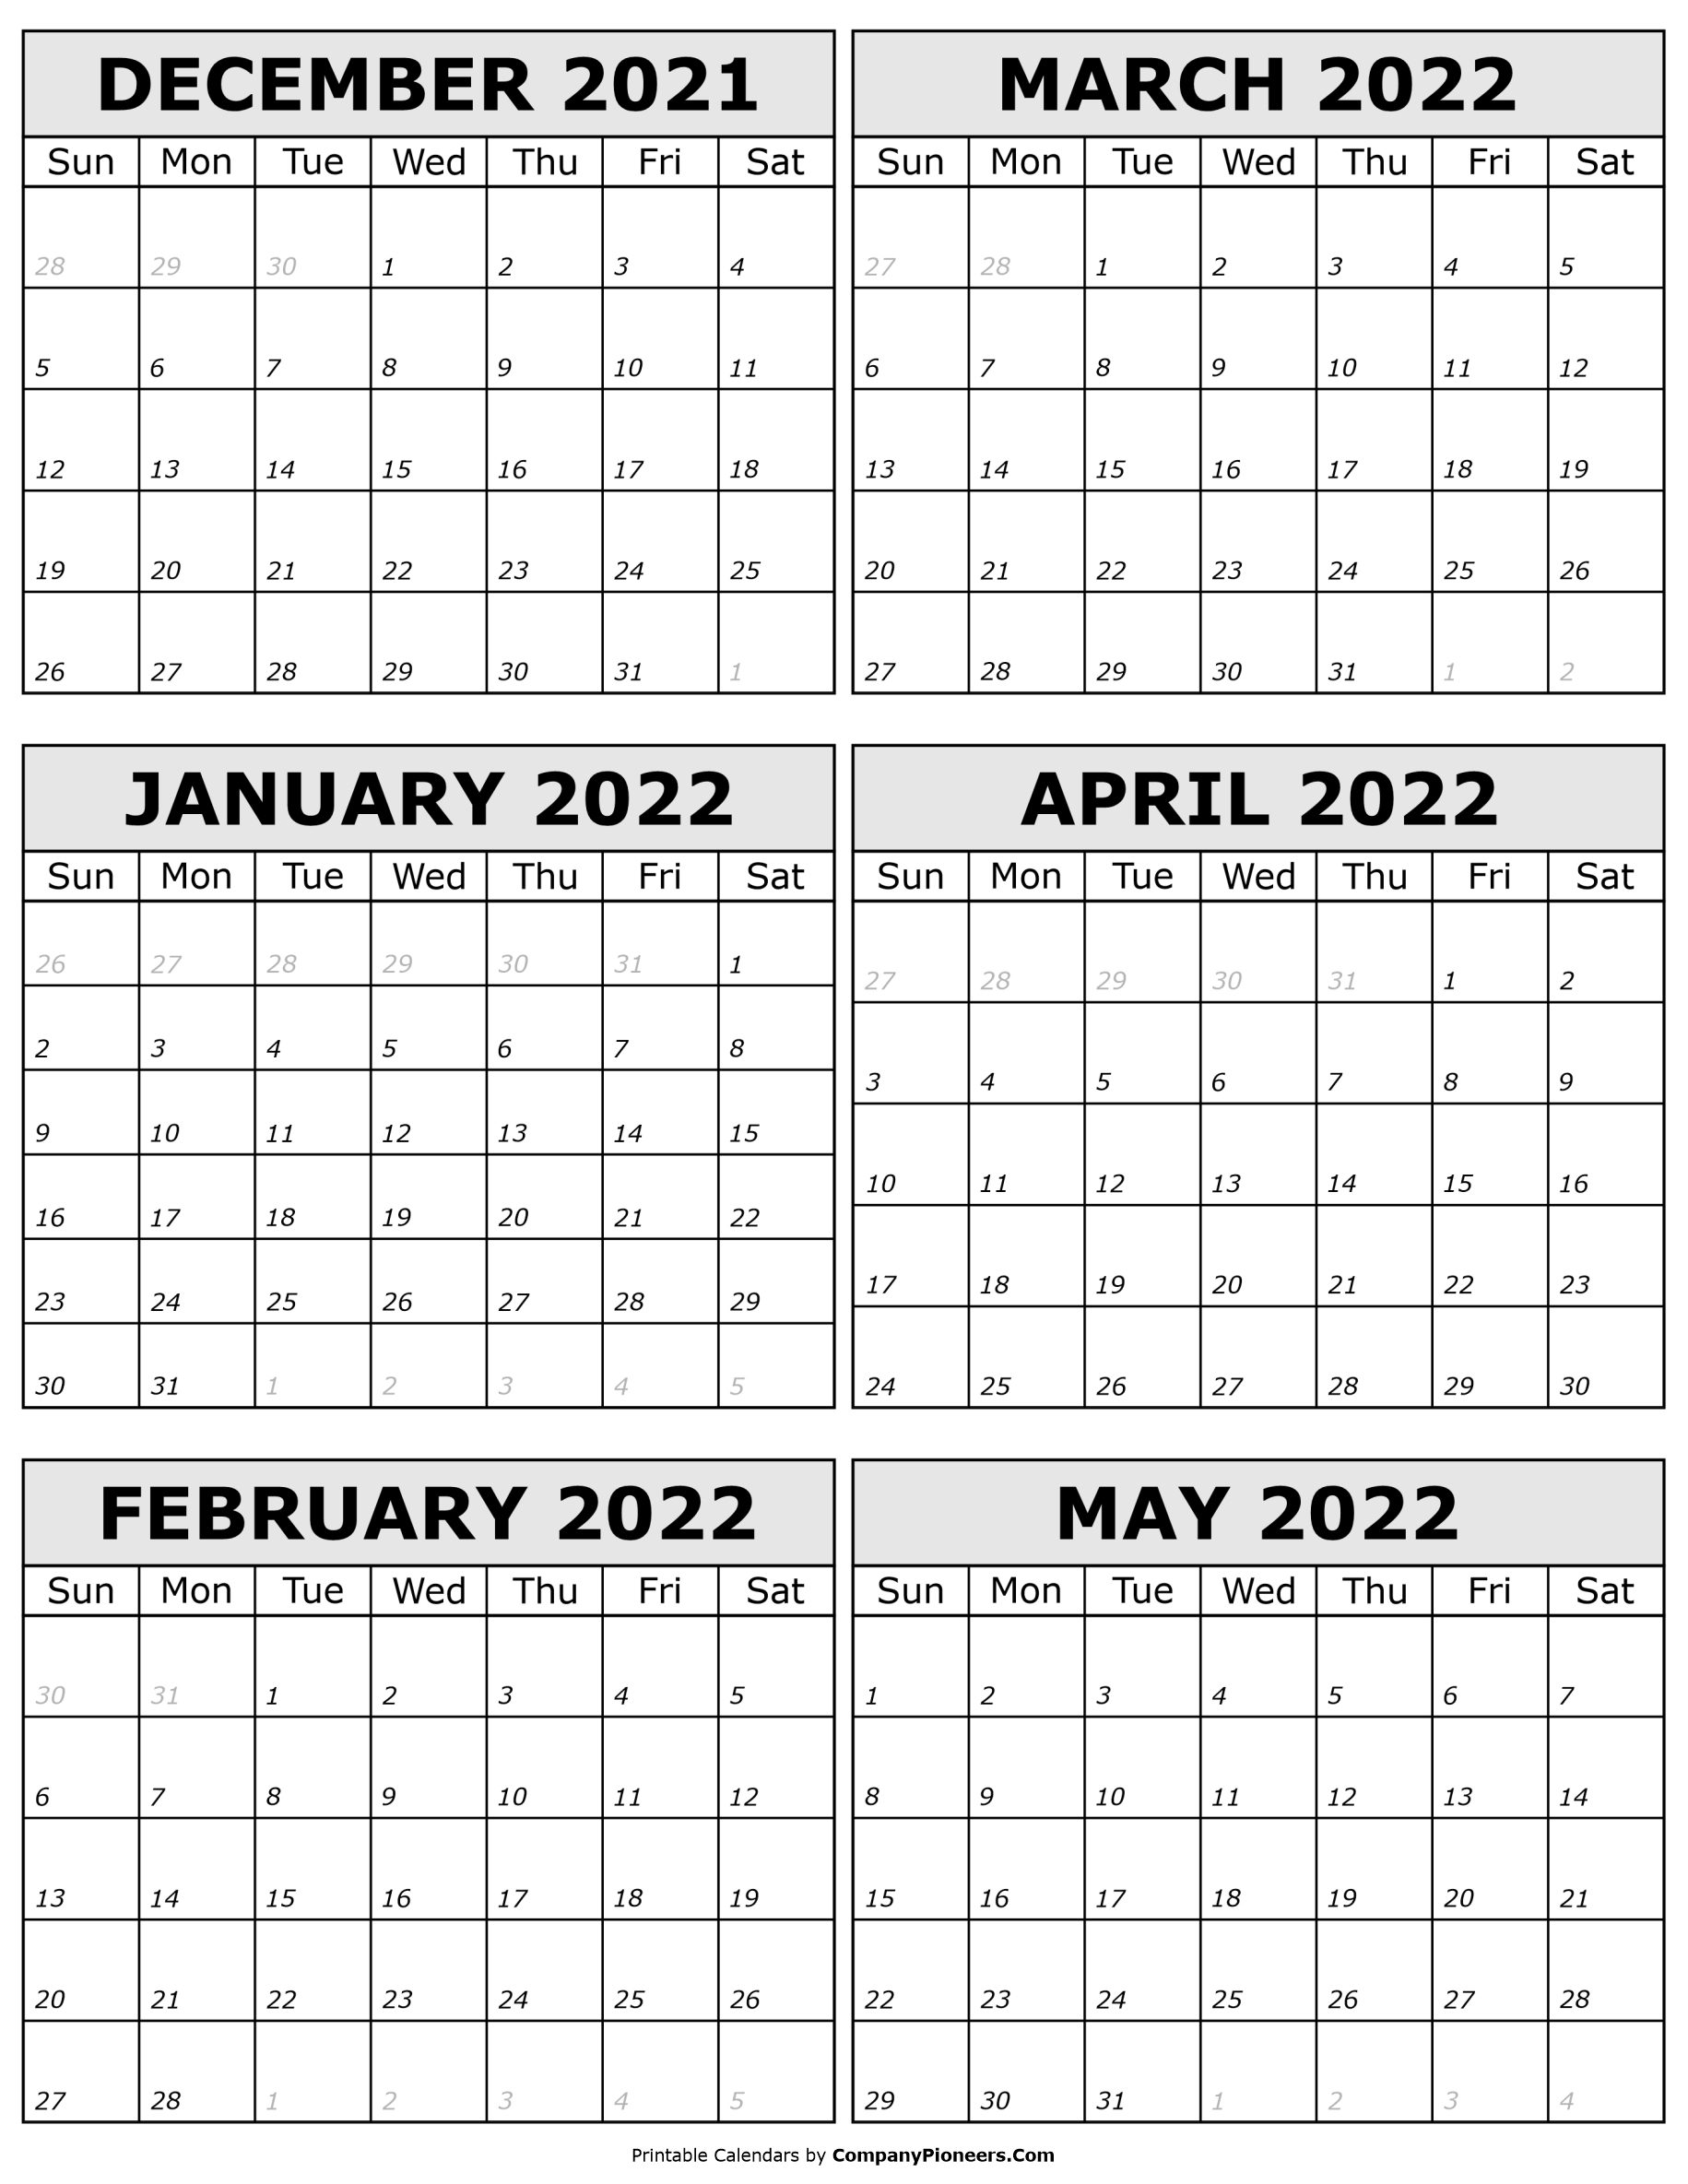 2021 December to 2022 May Calendar